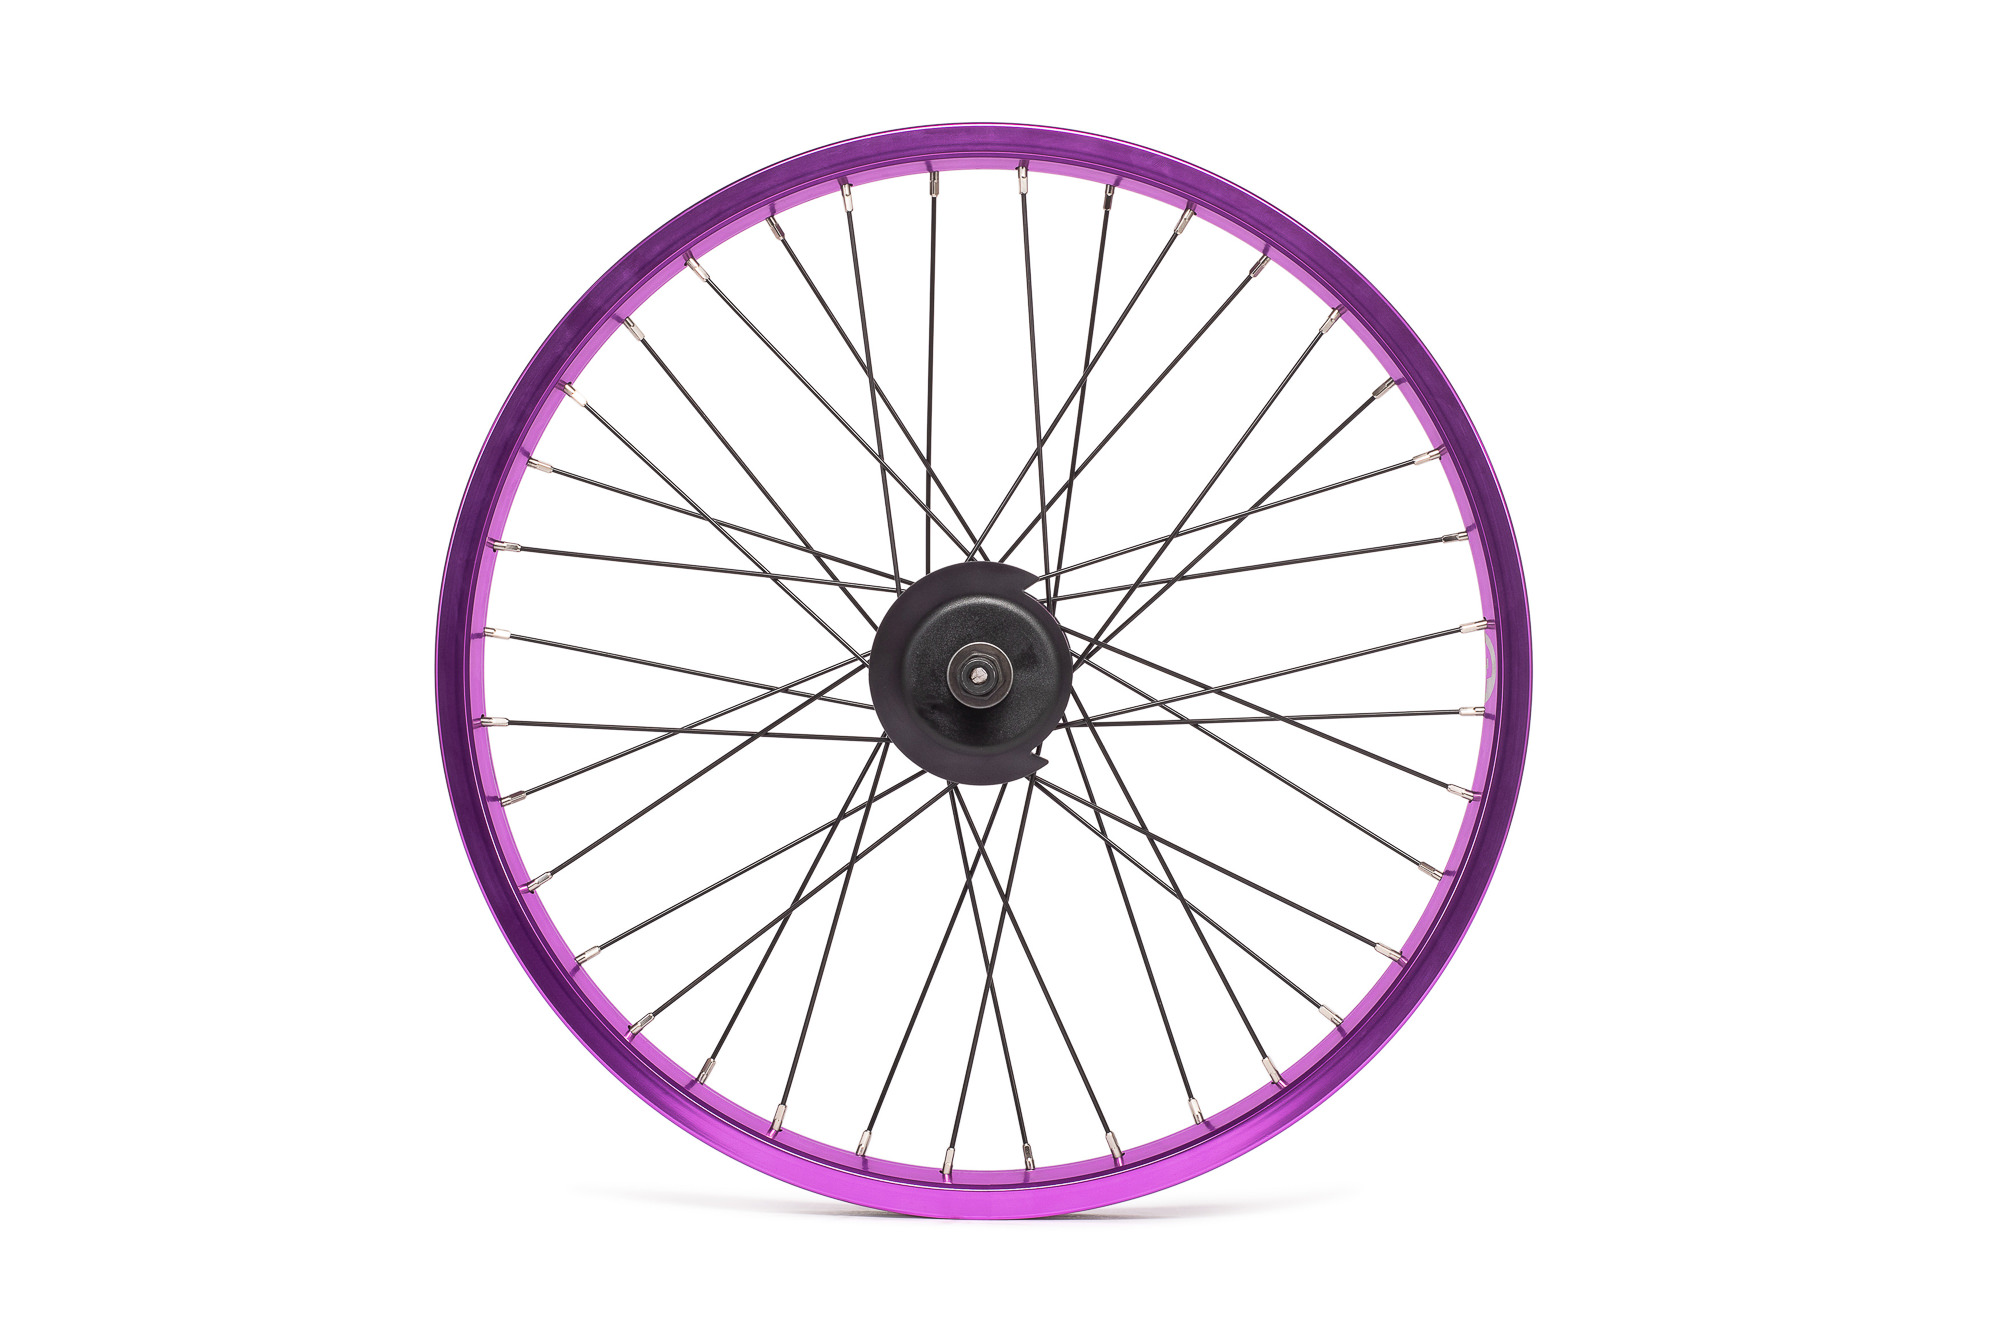 Salt_Everest_FC_rear_wheel_purple-01